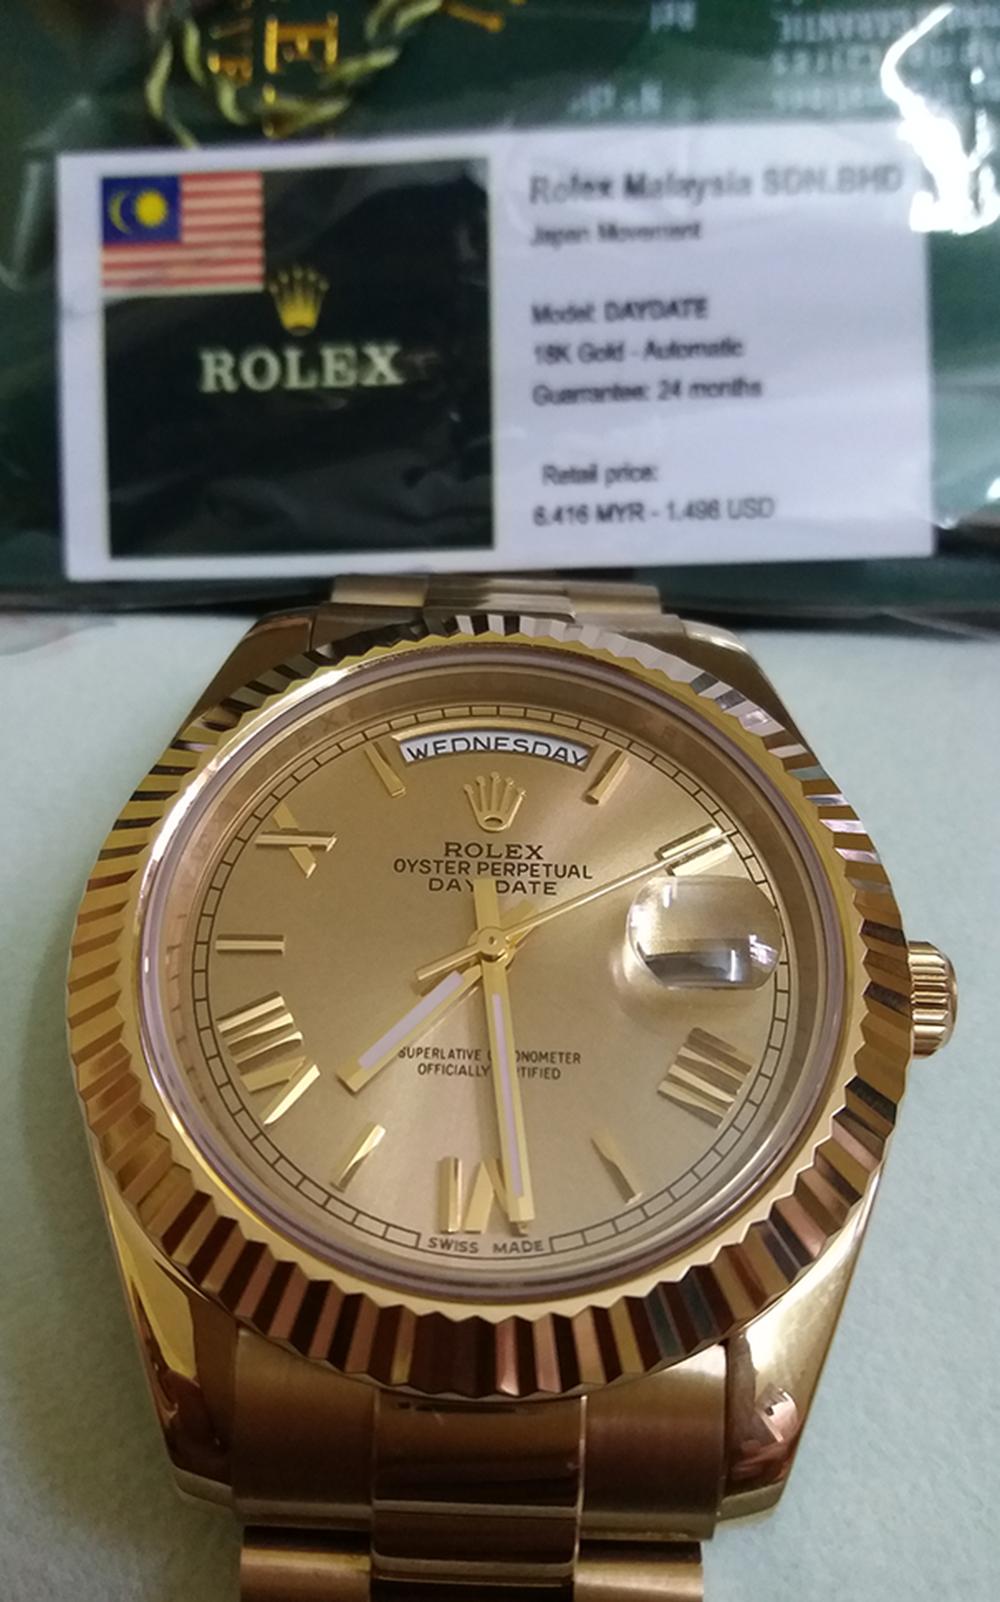 Rolex Malaysia, Omega, Tissot Thụy Sỹ fullbox 917USD giảm còn 255USD - 6